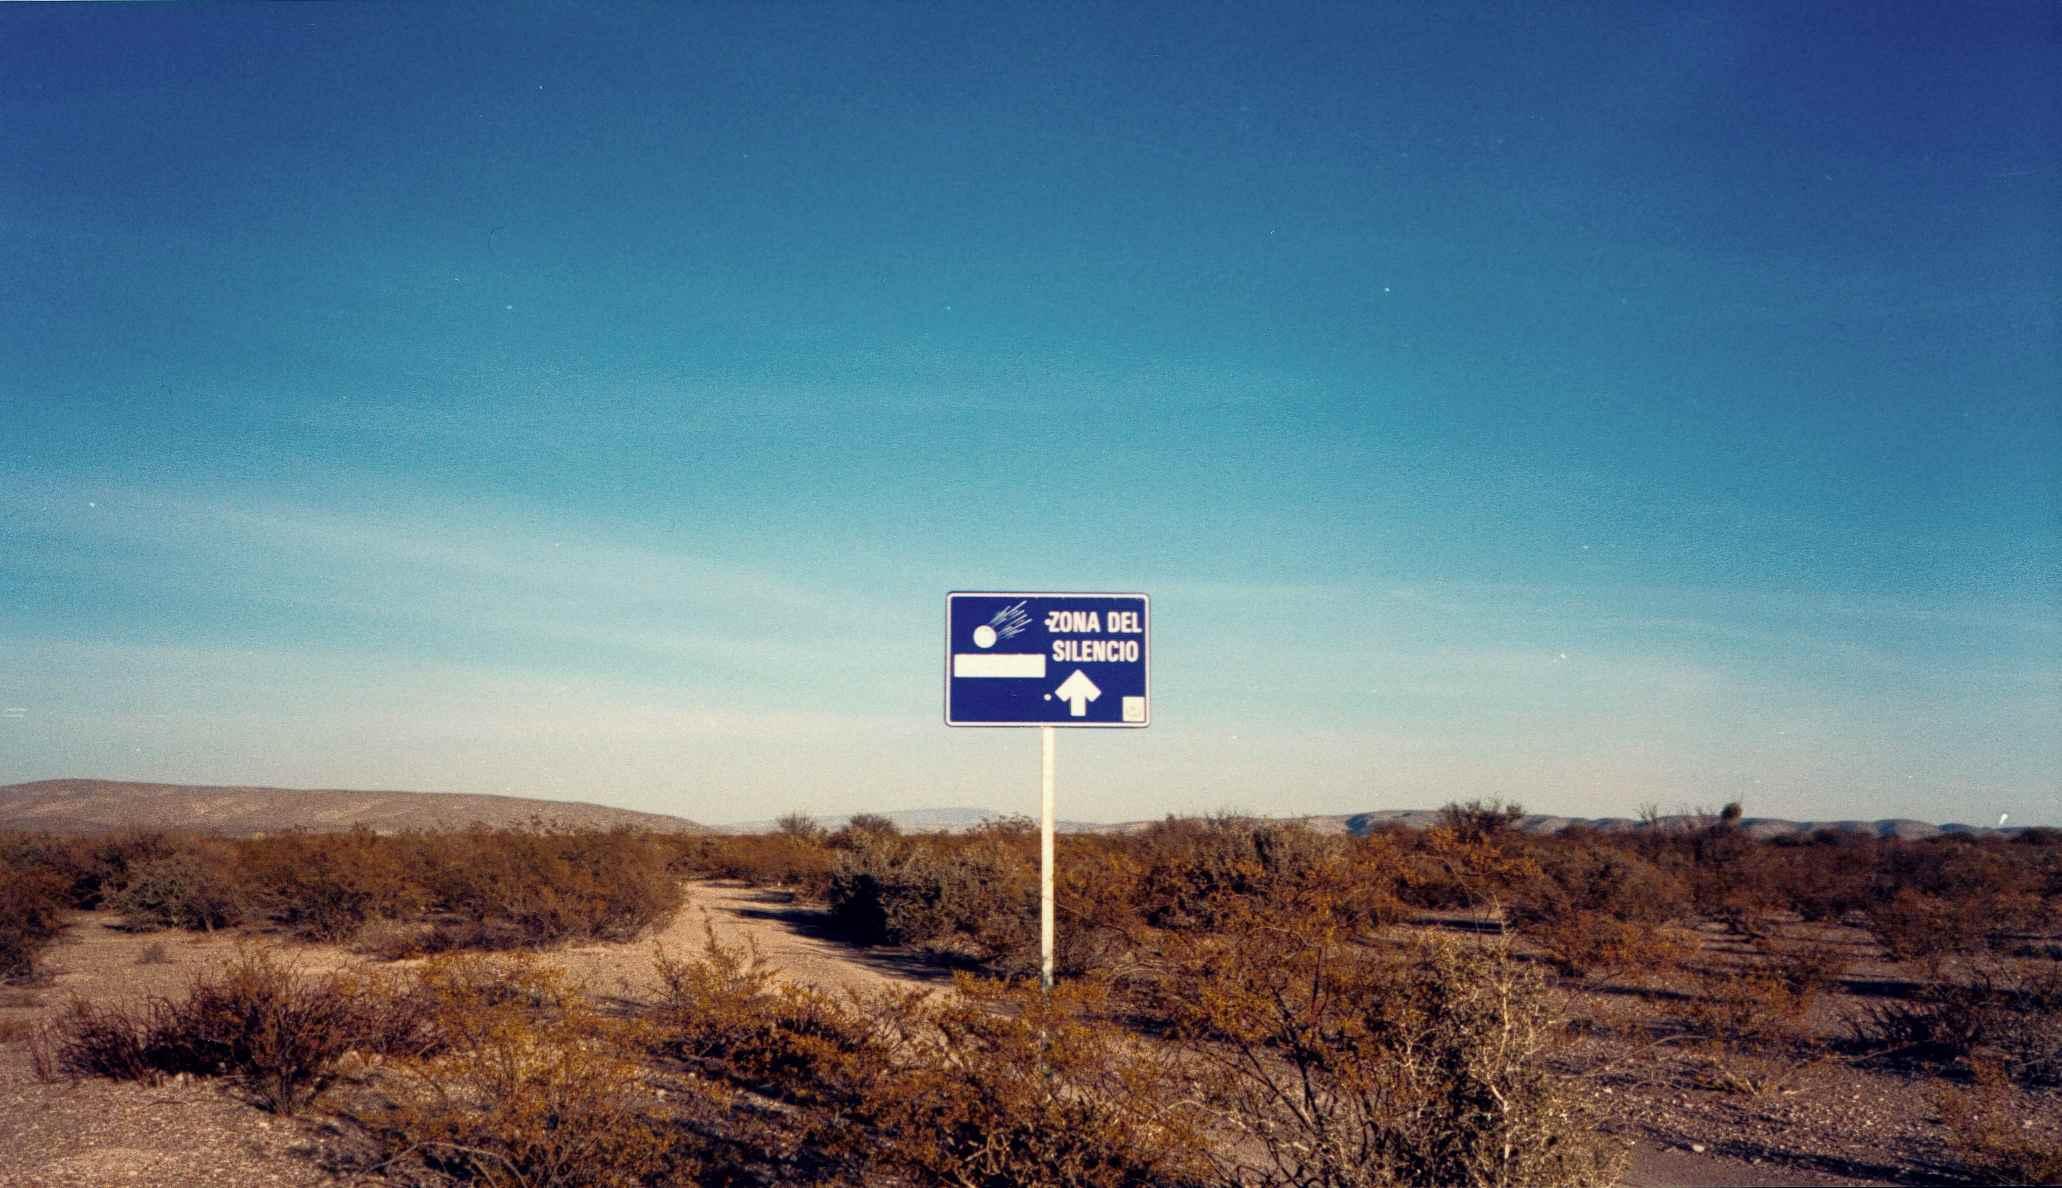 Zone Of Silence, Zona del Silencio, Chihuahua-woestijn, Noord-Mexico